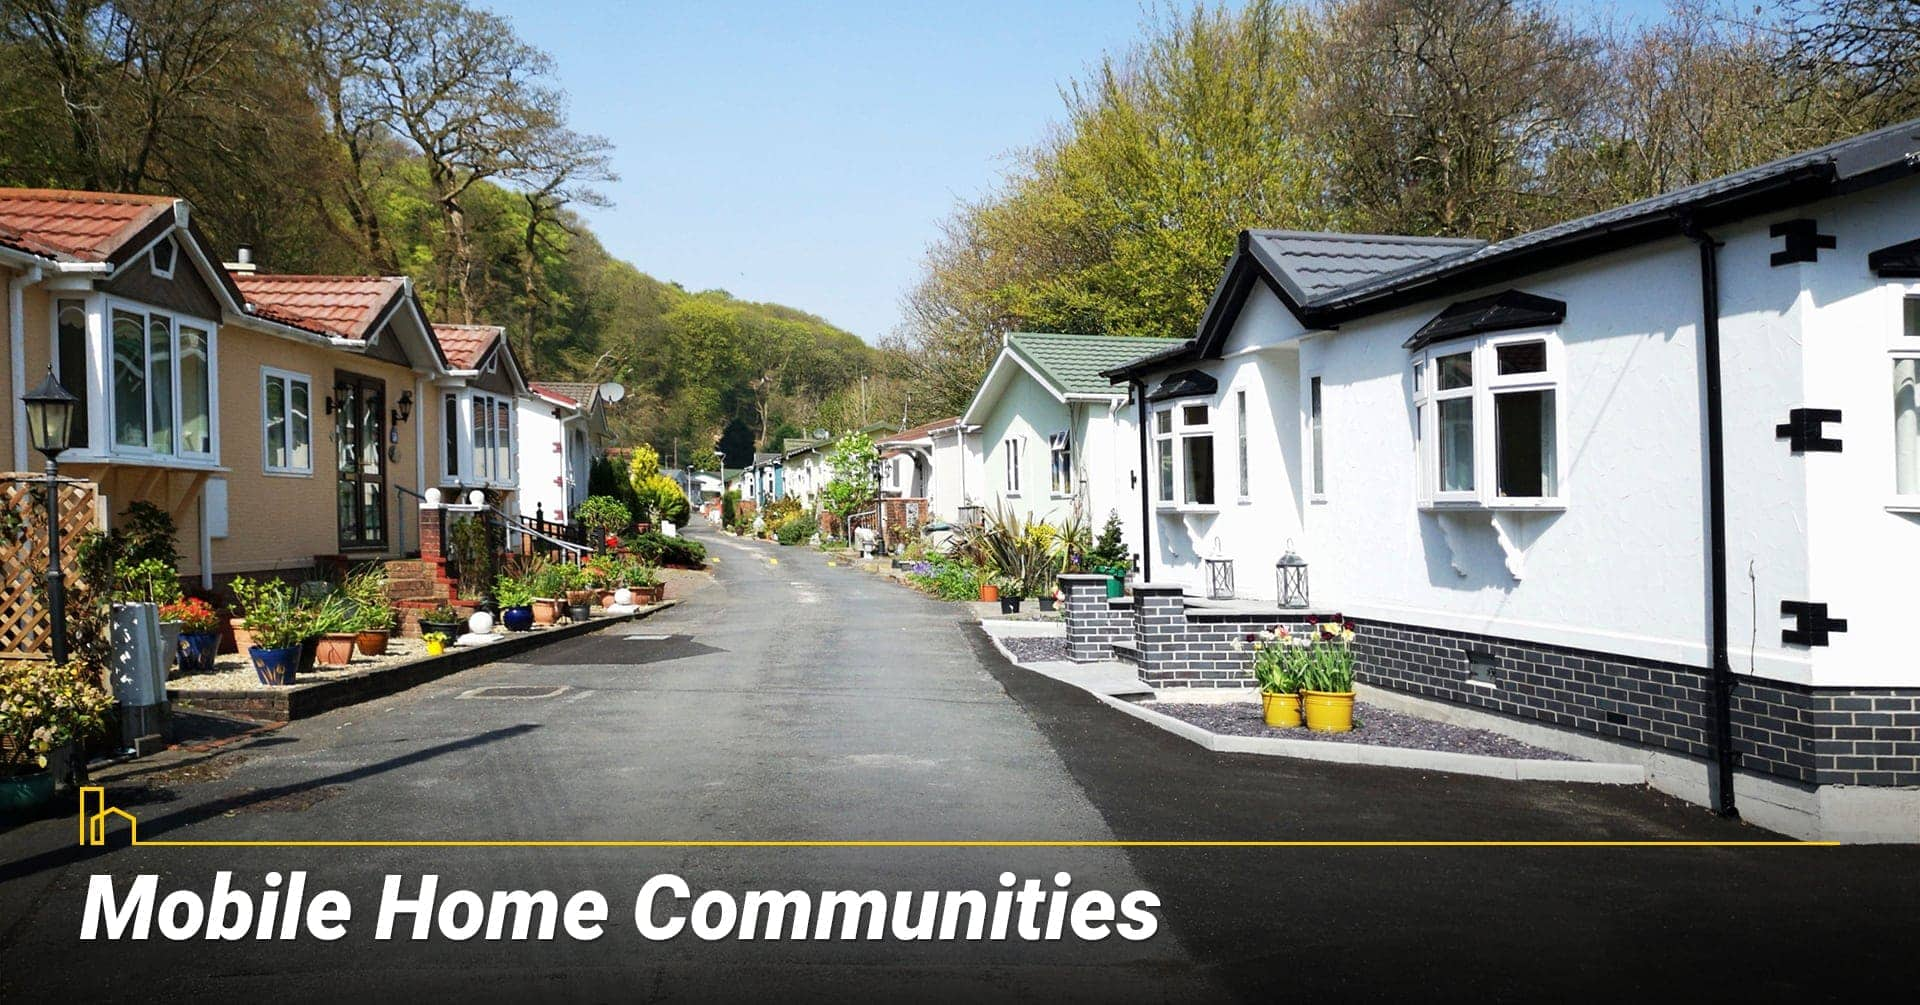 Mobile Home Communities, a sense of community